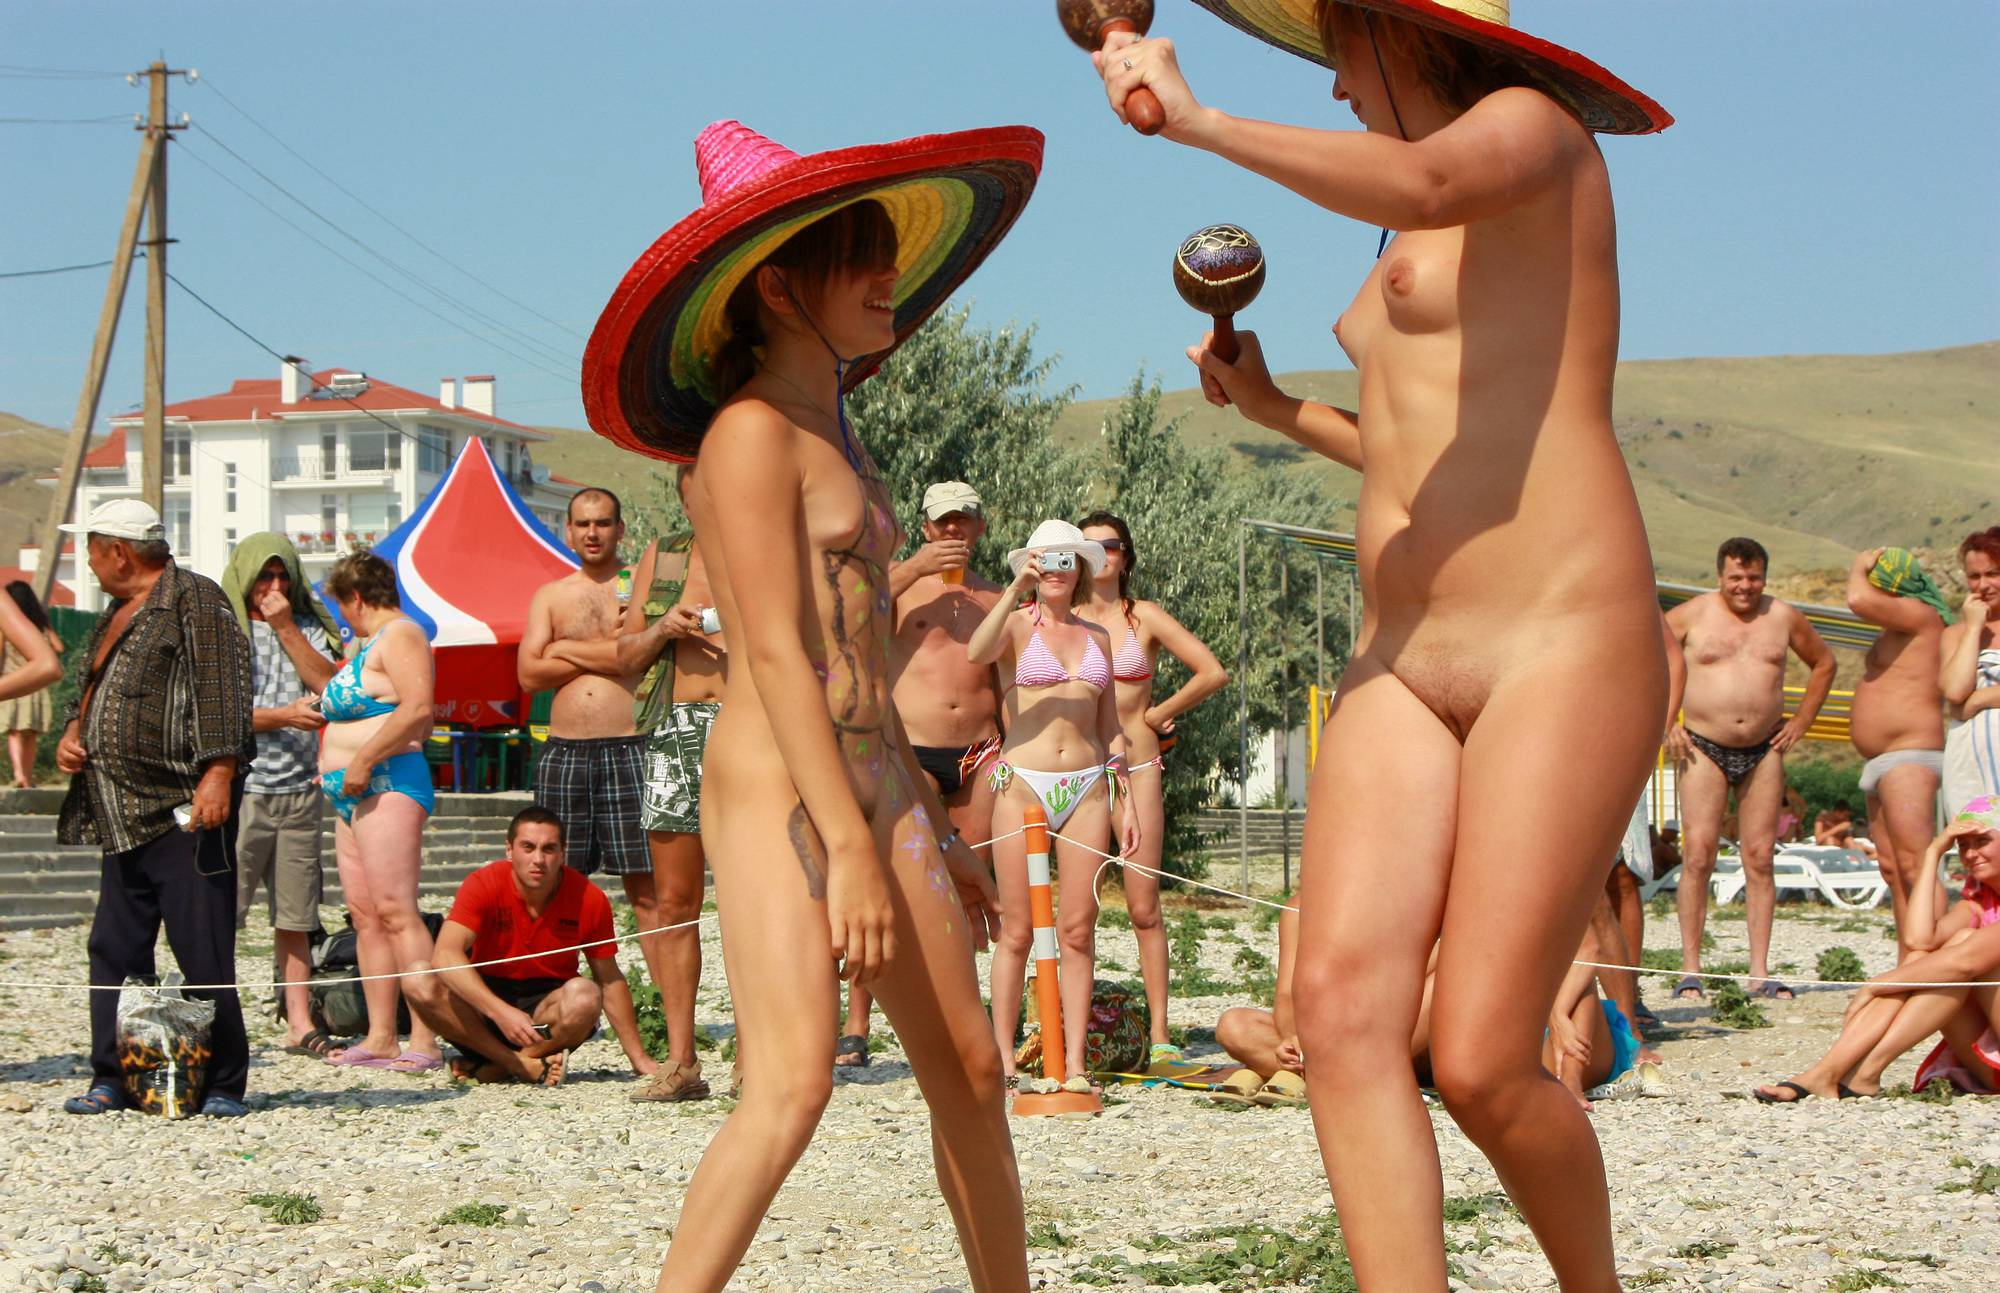 Nudist Pictures Neptune Mexican Dance - 2